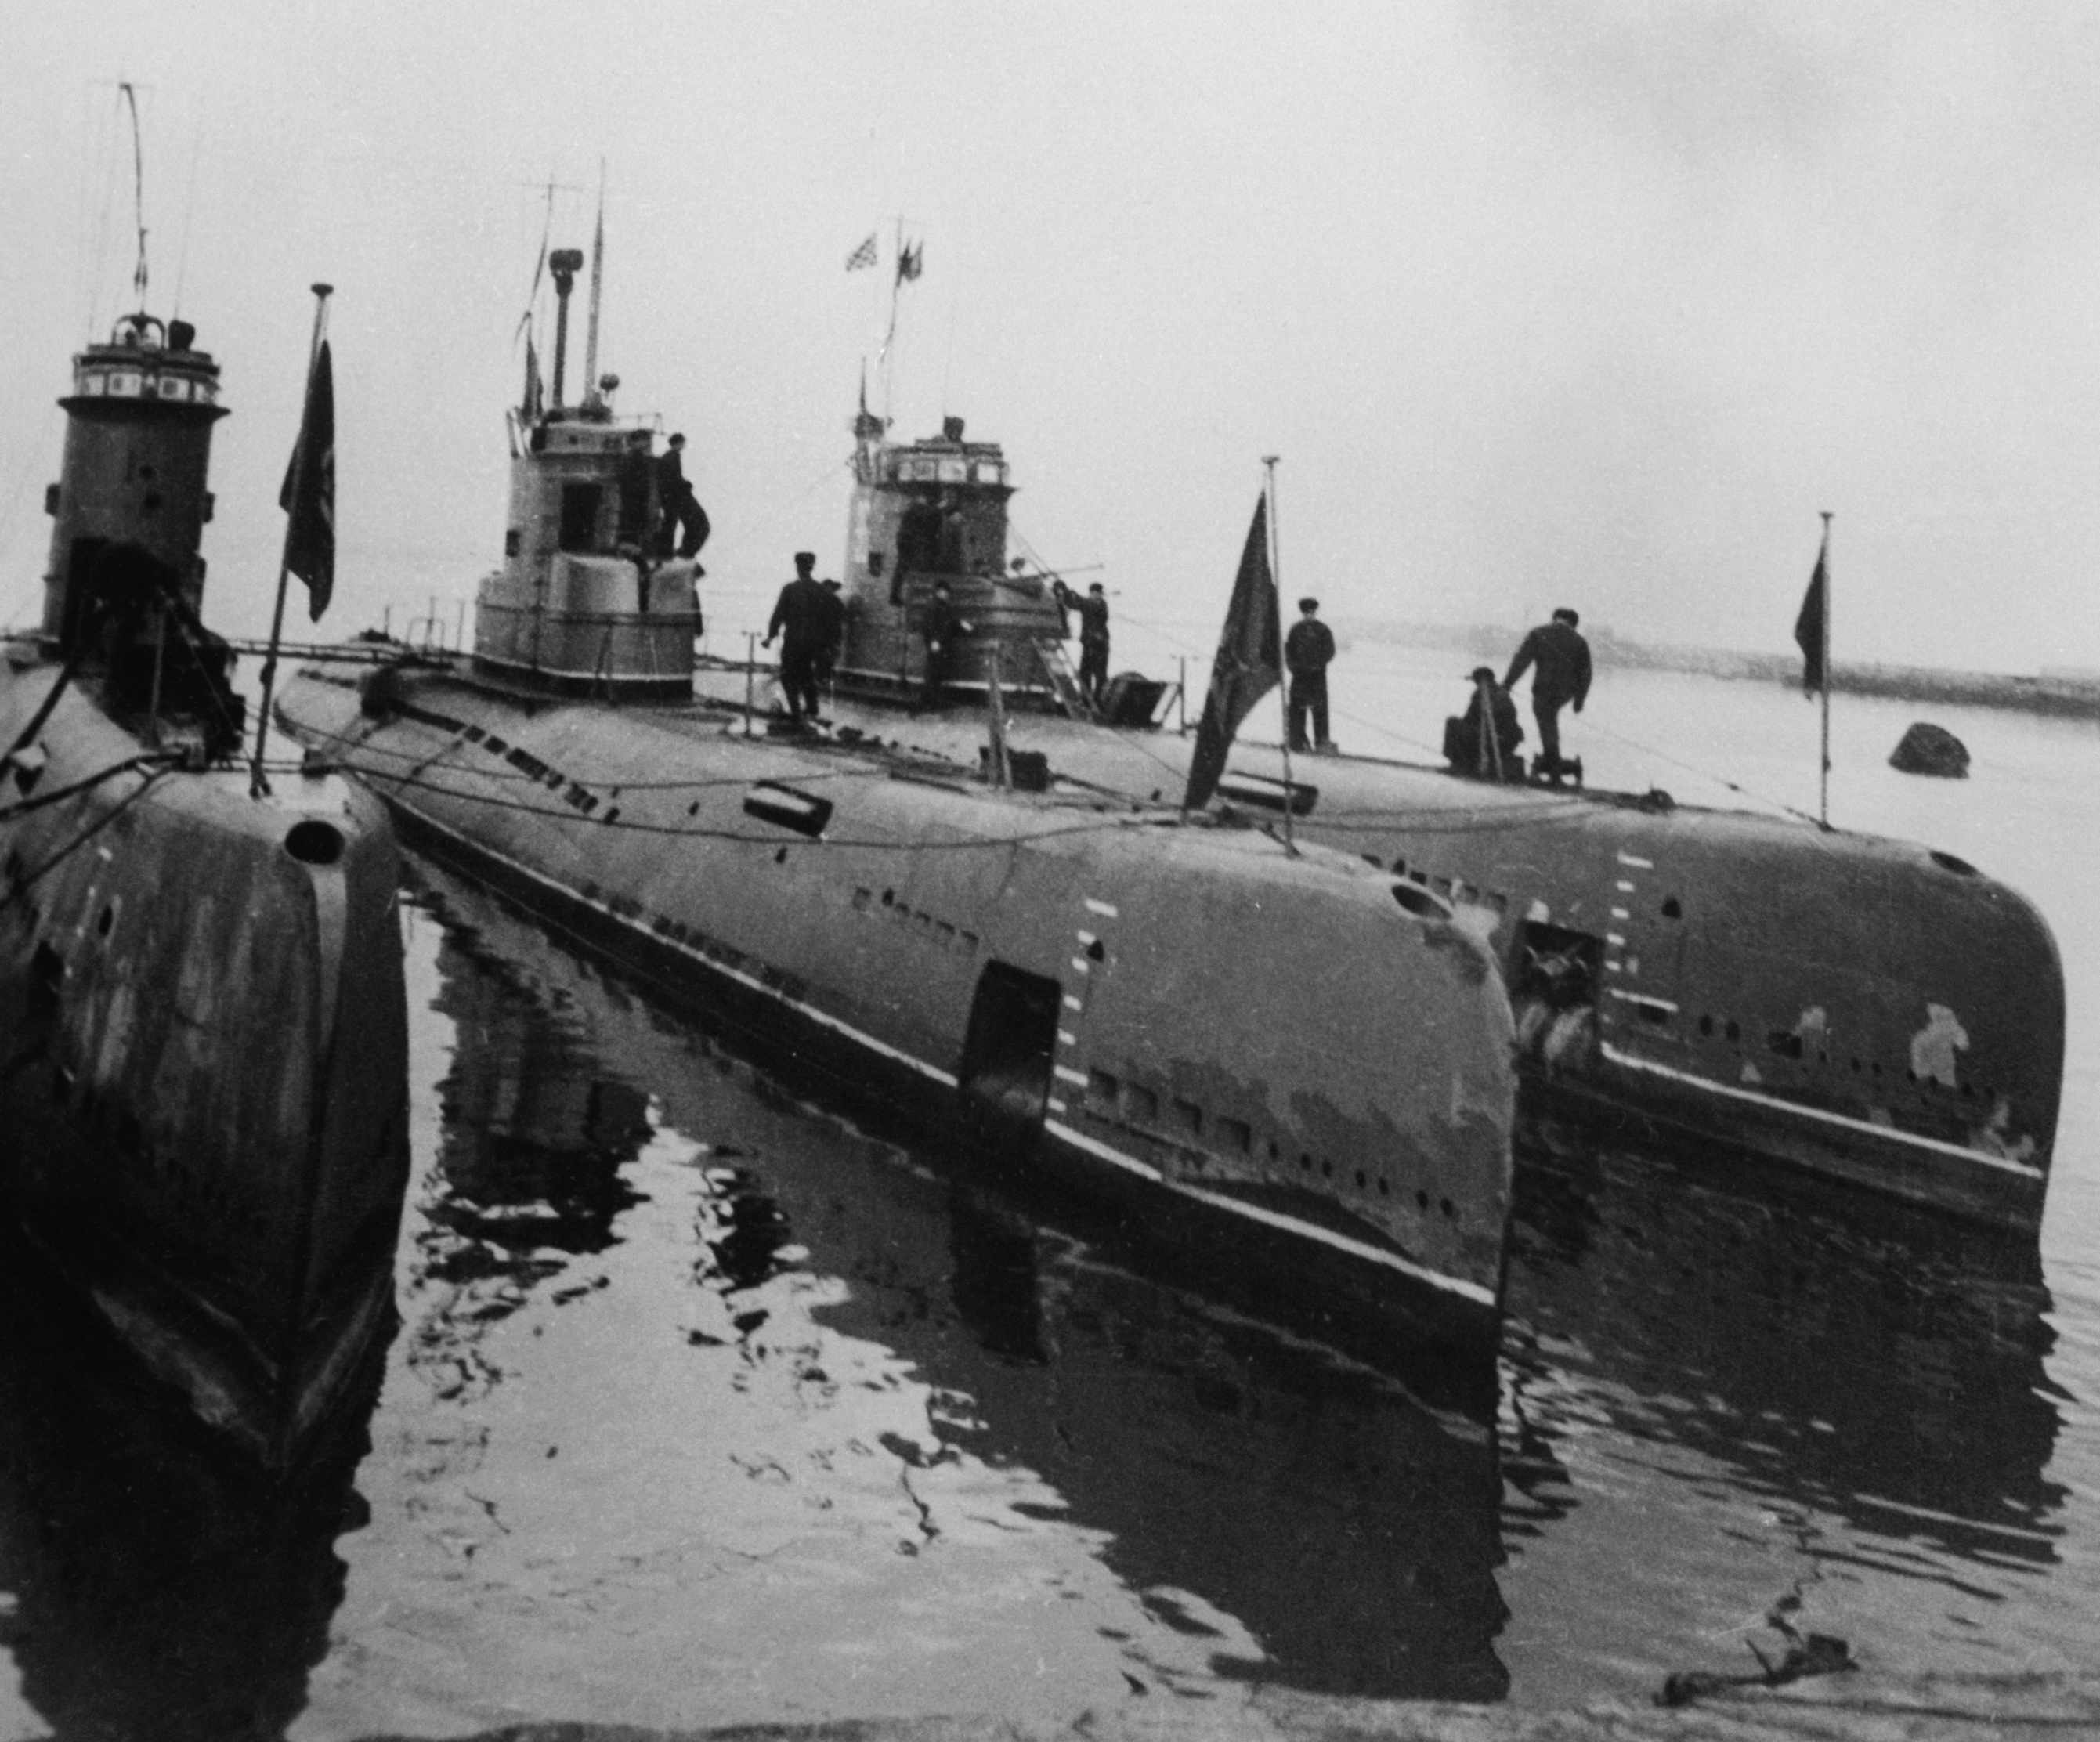 Soviet submarines. (Bettmann via Getty Images)